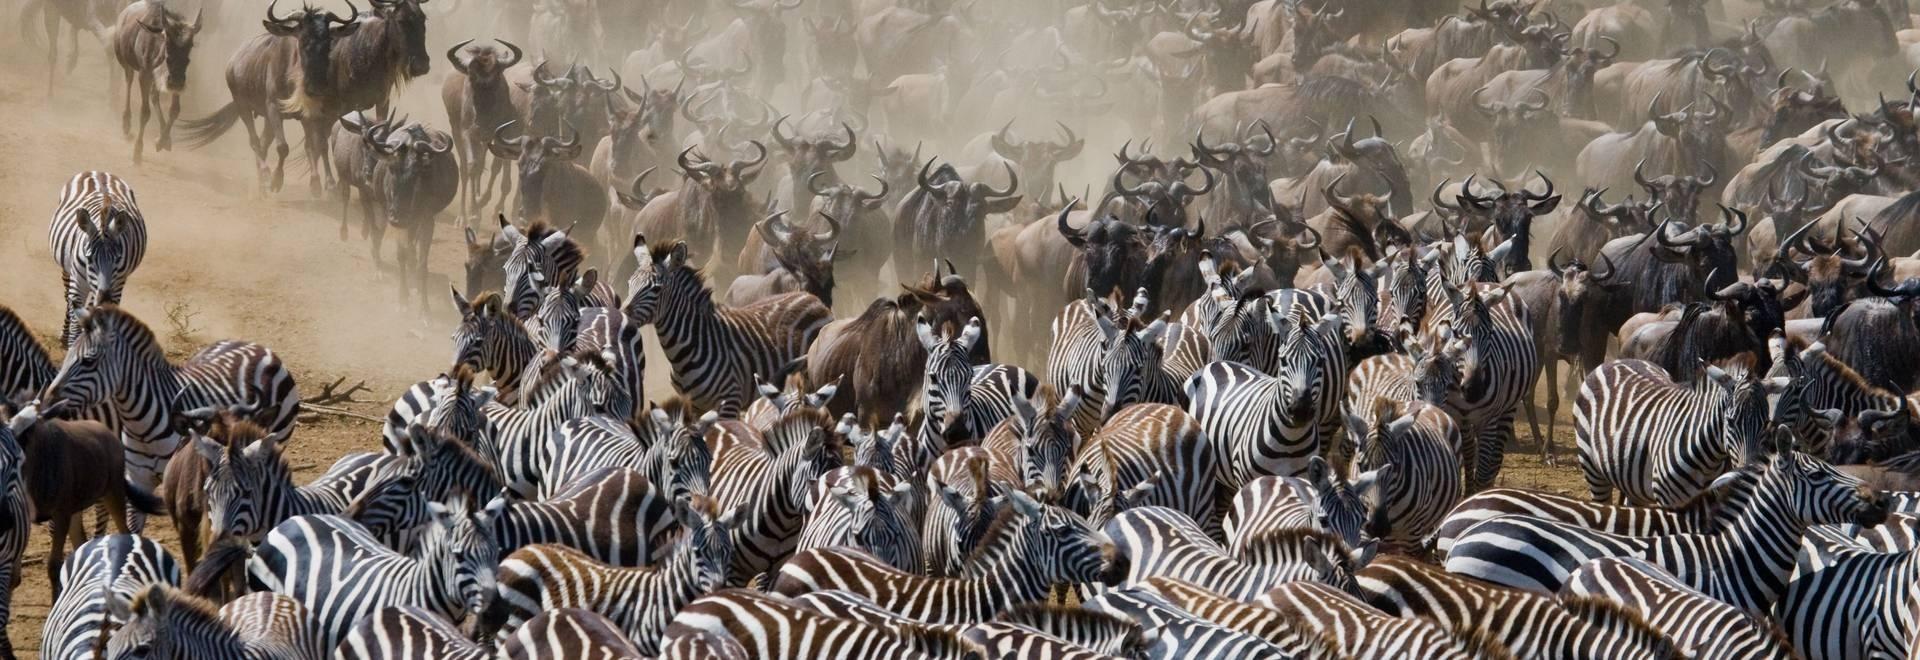 Wildlife Holidays In Kenya - Naturetrek Calendar Holidays In Kenya